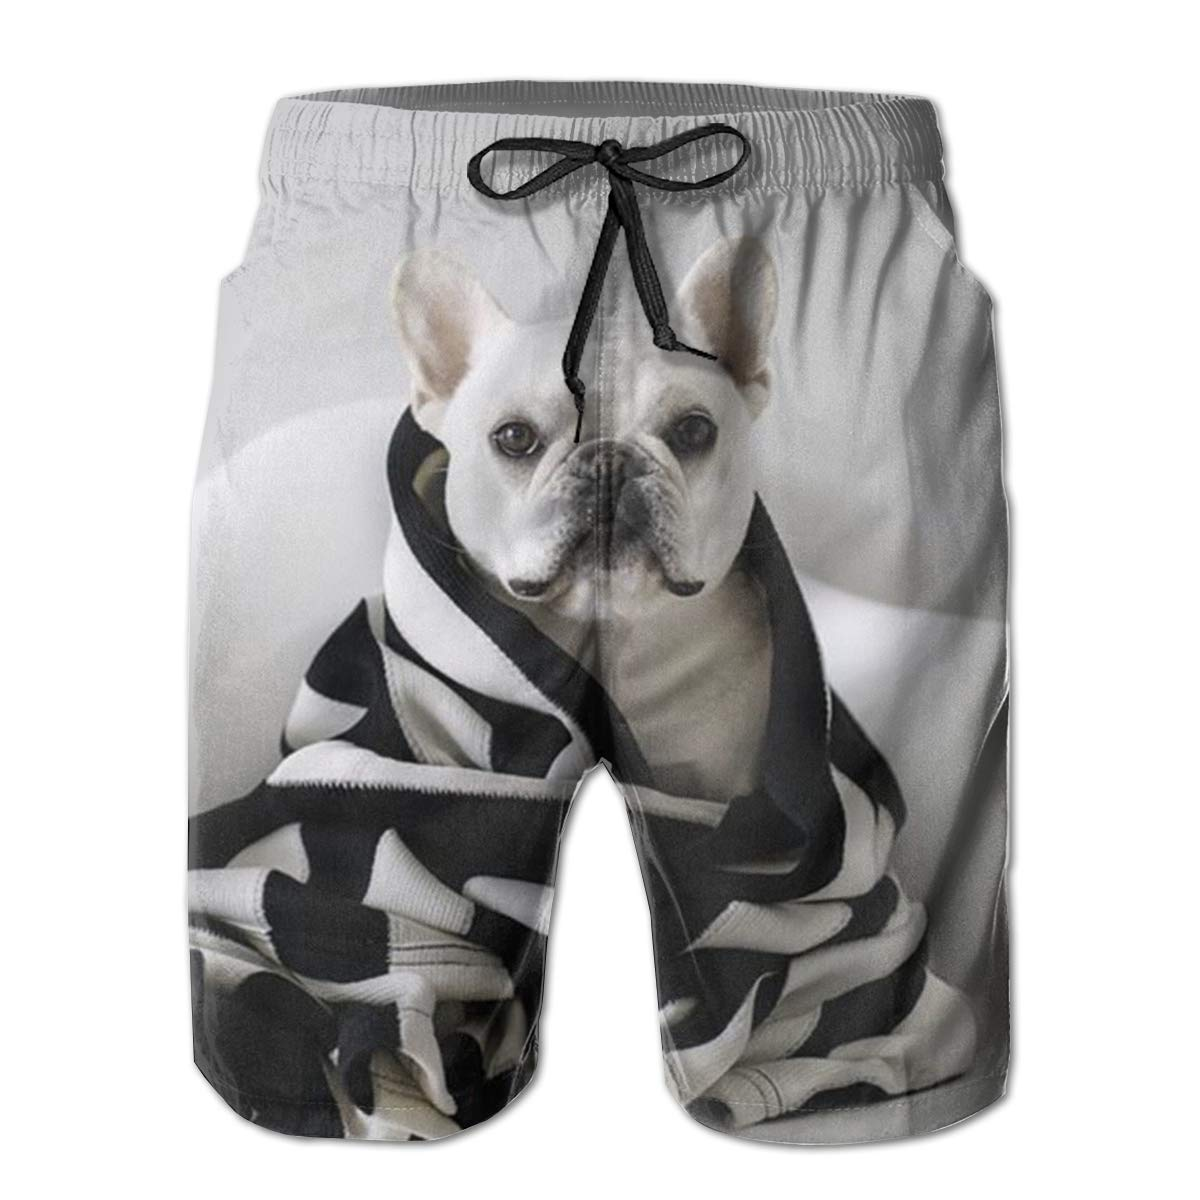 Wexzss French Bulldog Funny Summer Quick-Drying Swim Trunks Beach Shorts Cargo Shorts